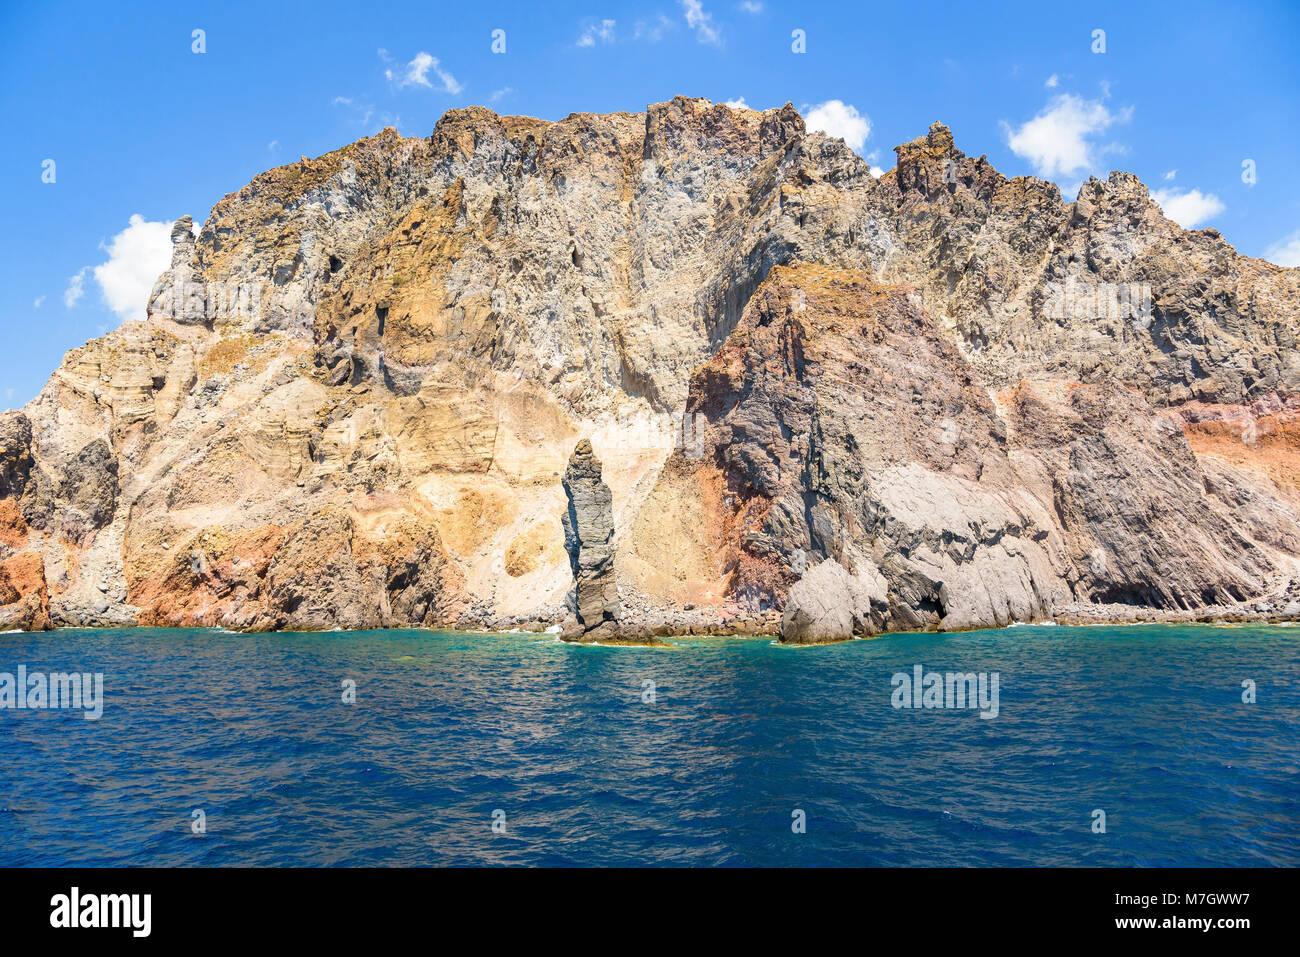 Rocky cliff coast of the Lipari Island seen from the sea, Aeolian Islands, Italy Stock Photo